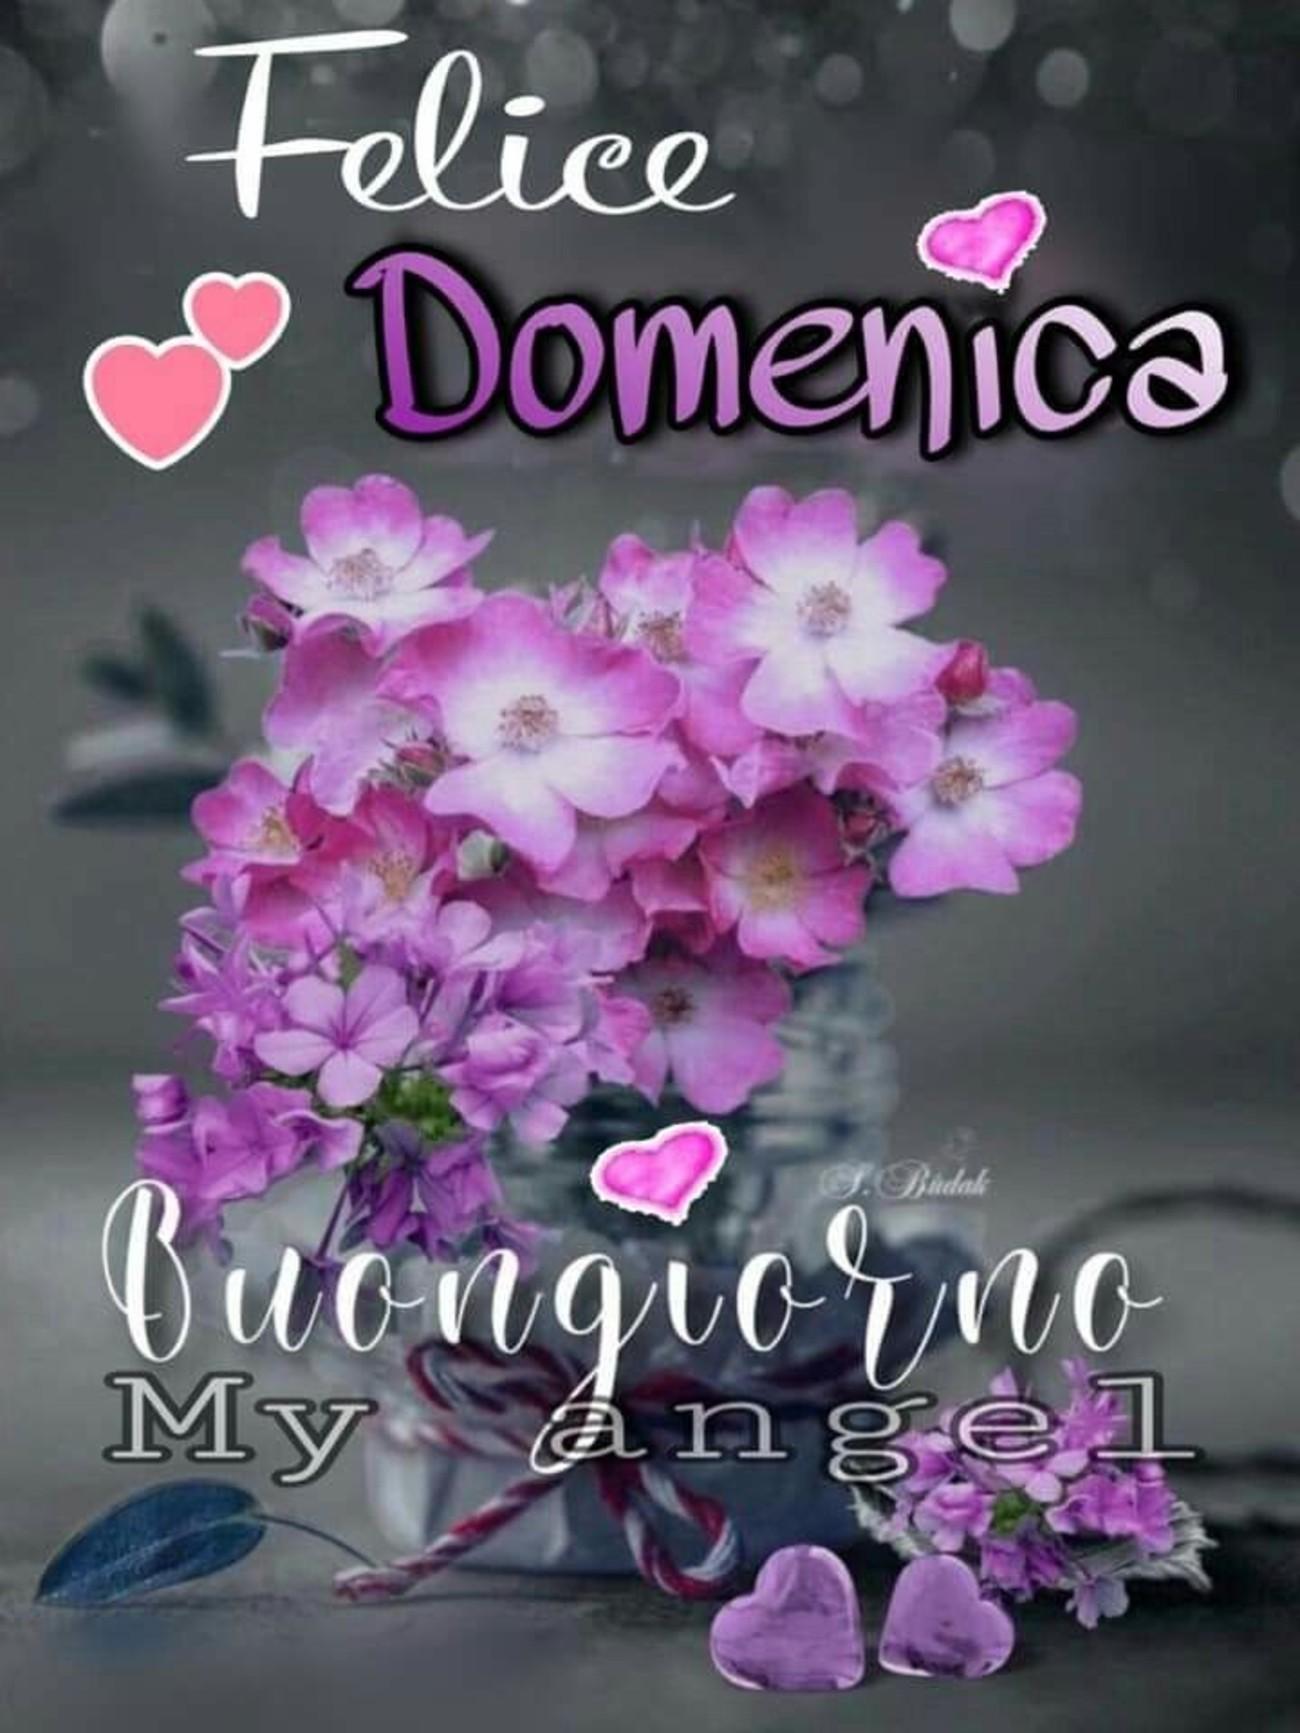 Felice Domenica, Buongiorno (my angel)